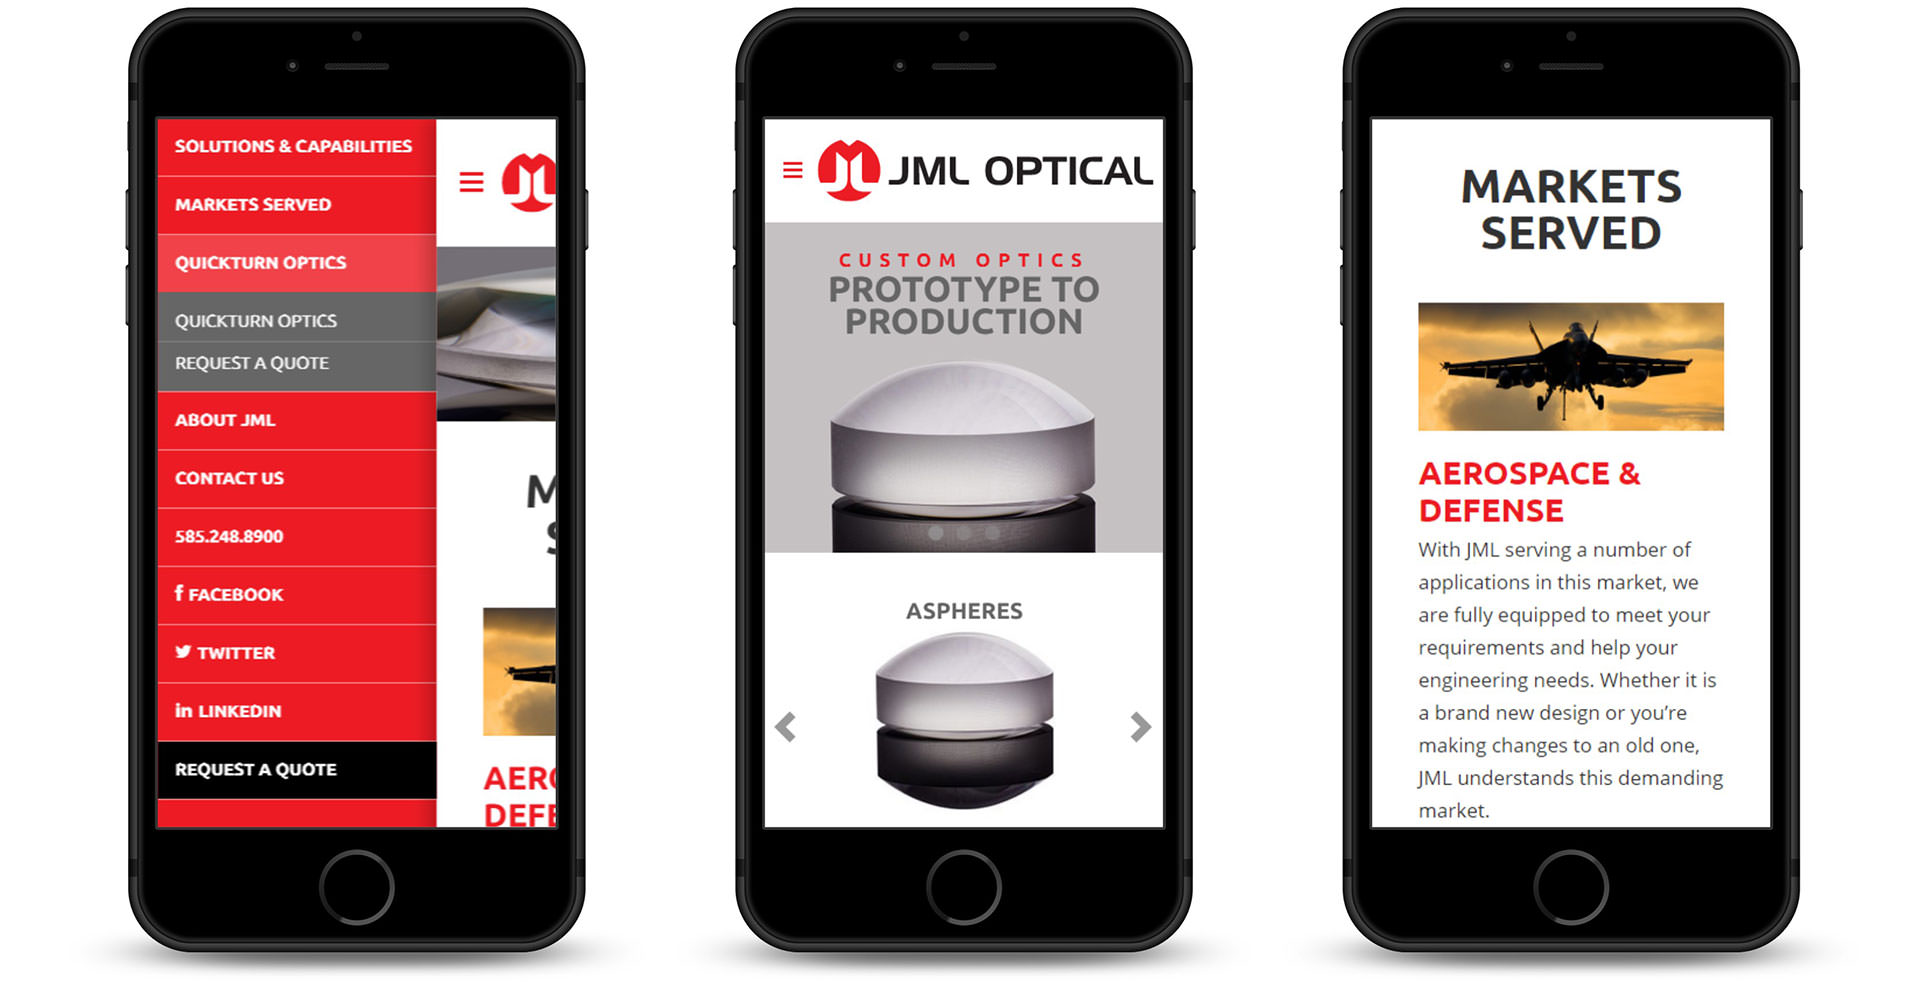 JML Optical optimized for mobile responsiveness.